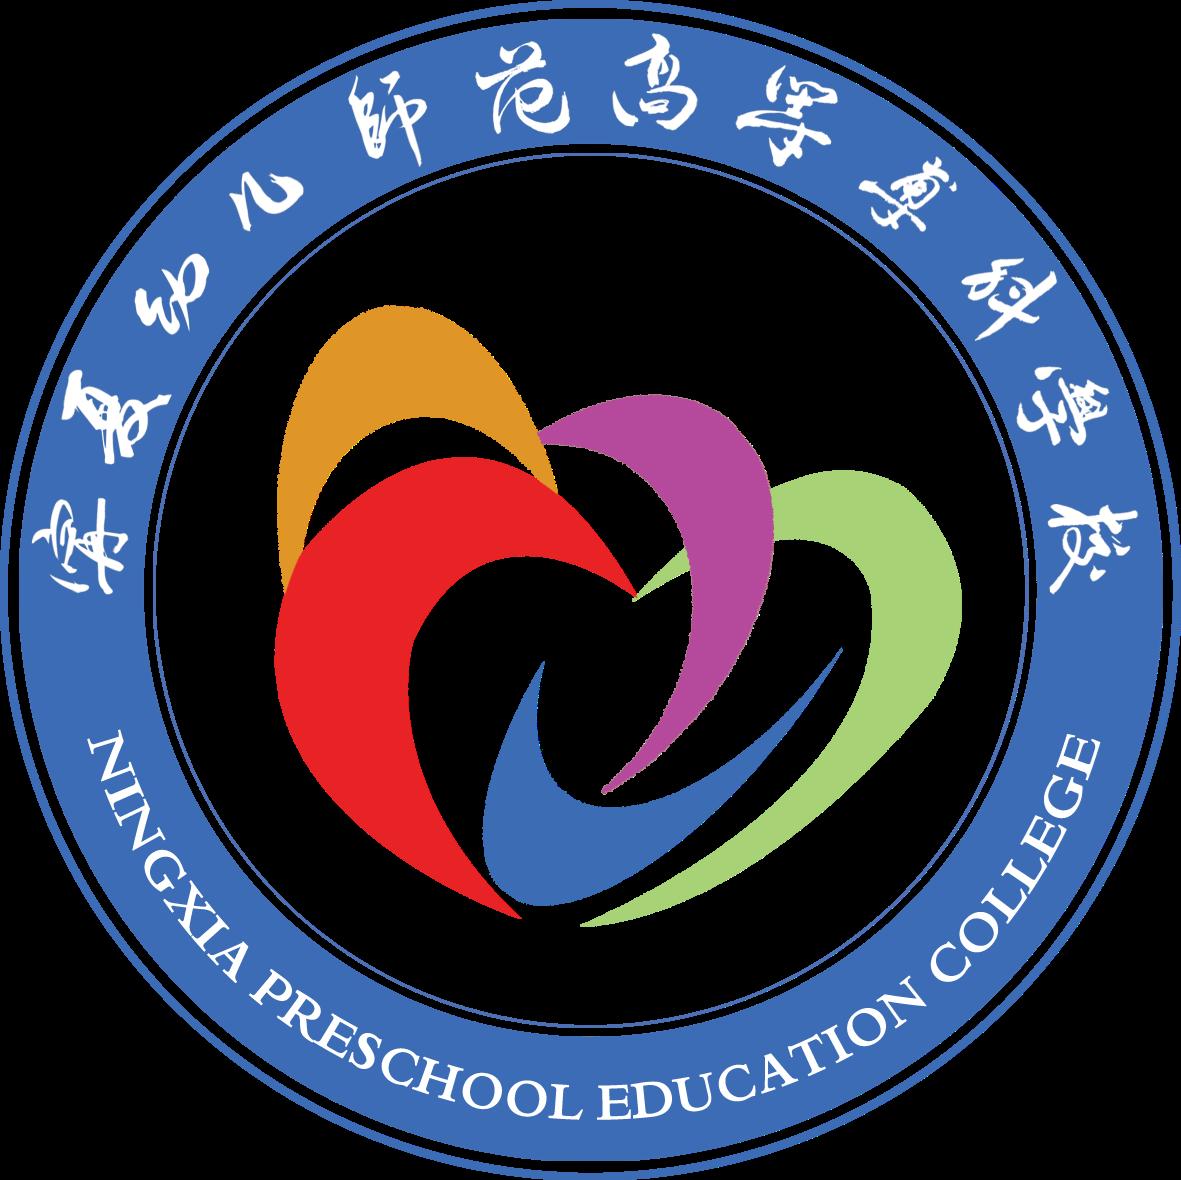 Ningxia Preschool Education College